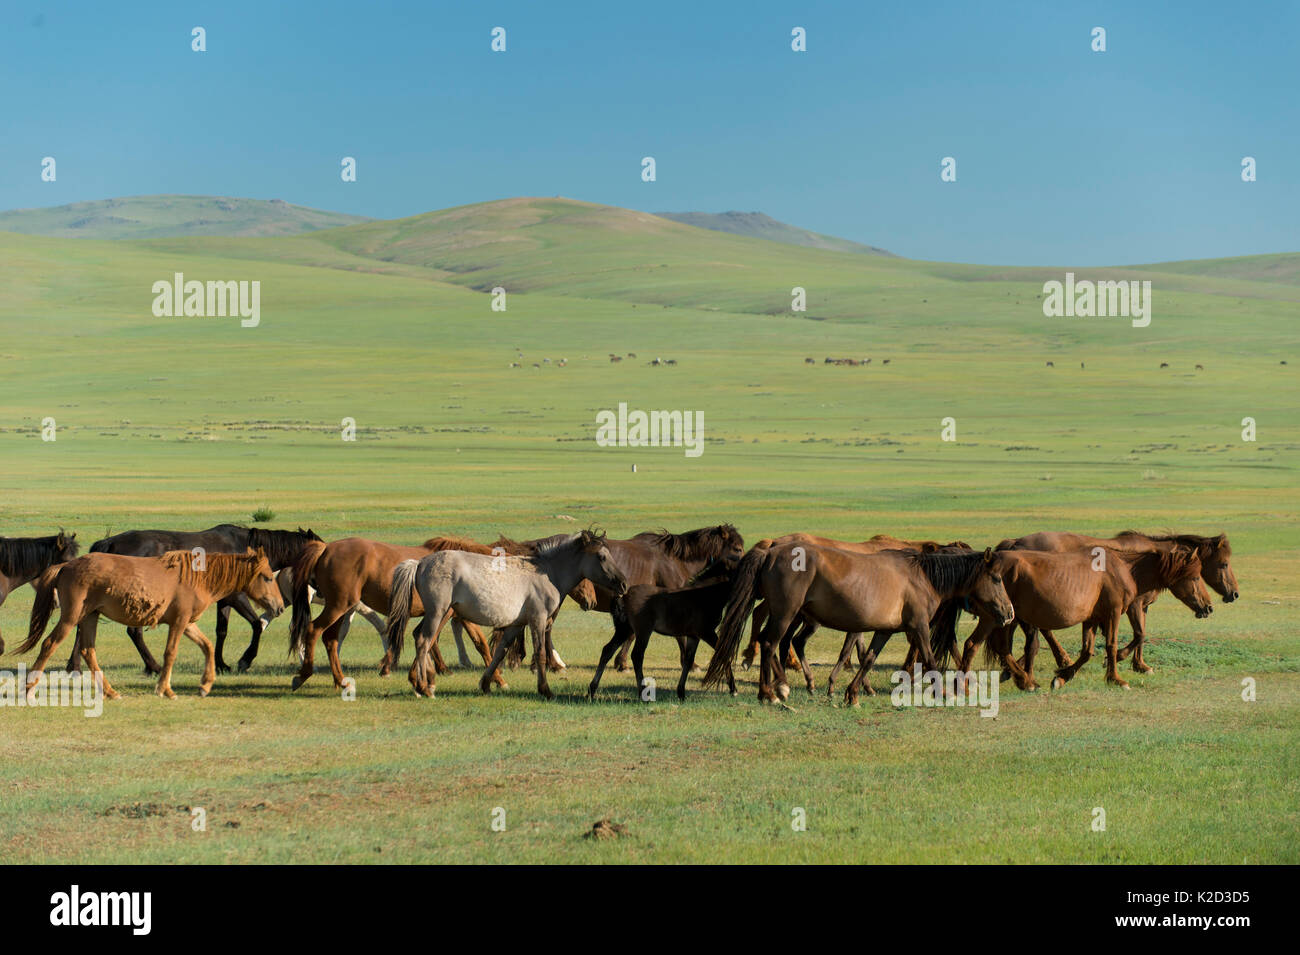 Domestic horses in Gobi desert, Umnugovi province, South Mongolia. - Stock Image